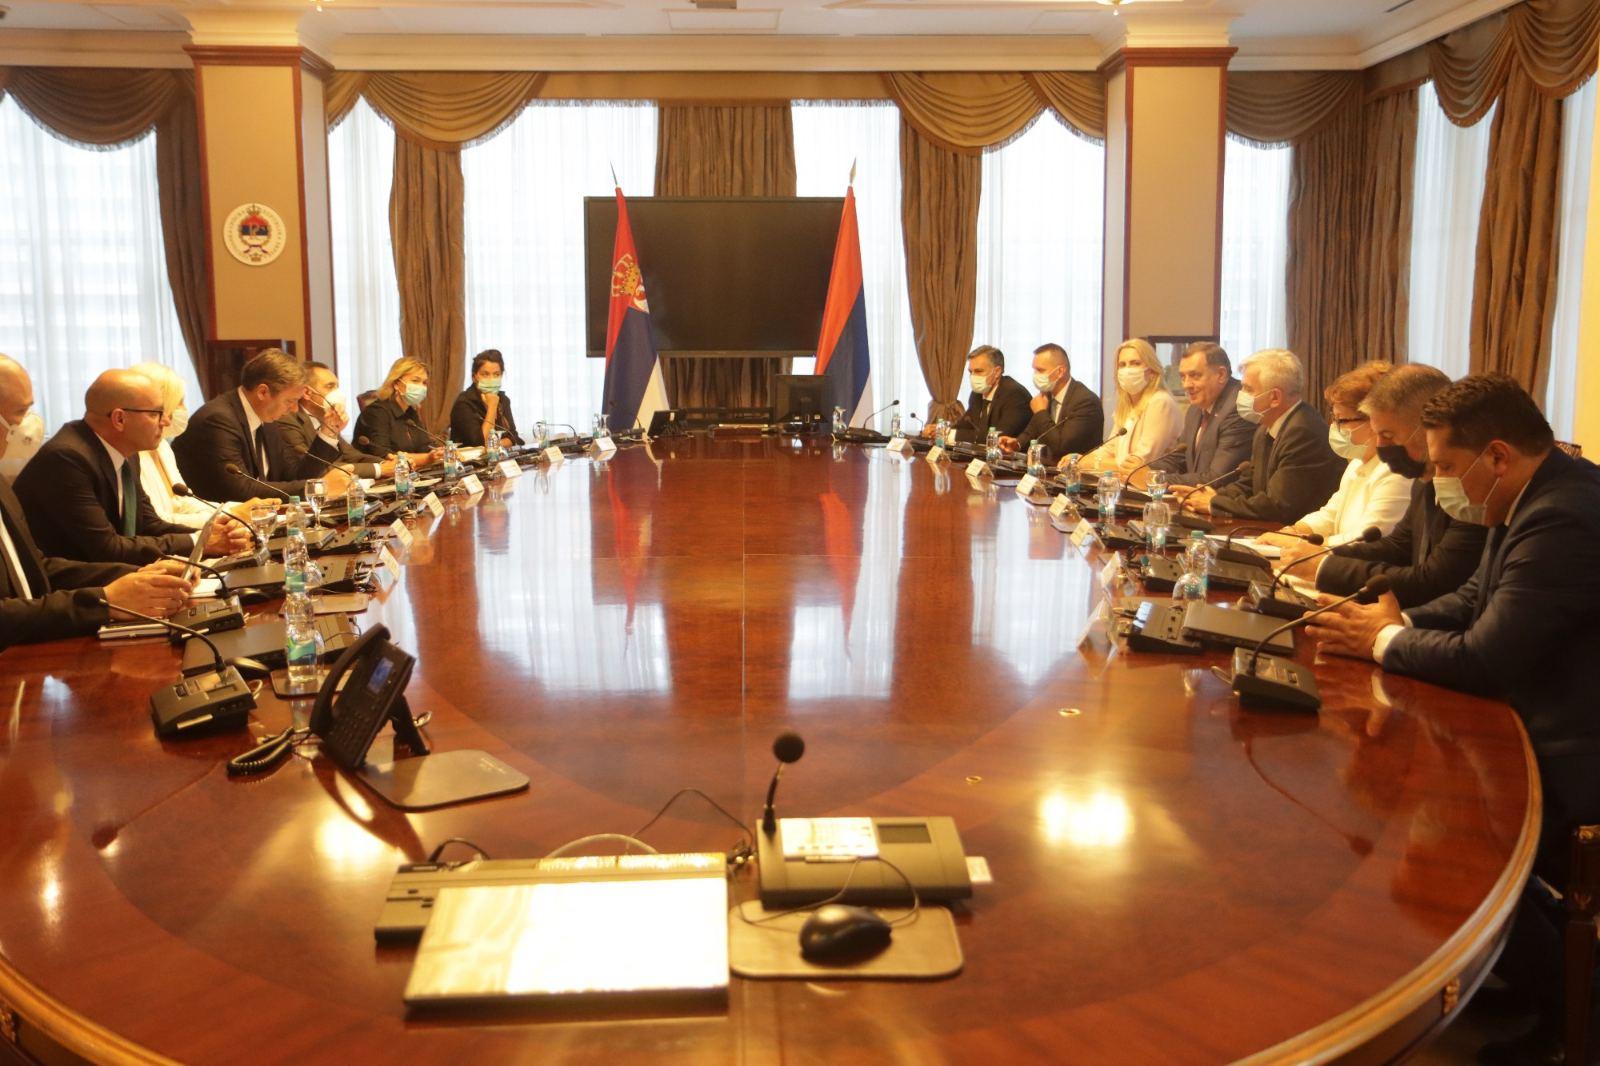 BiH: Dodik exploits Vučić's visit to Banja Luka to promote separatist ideologies